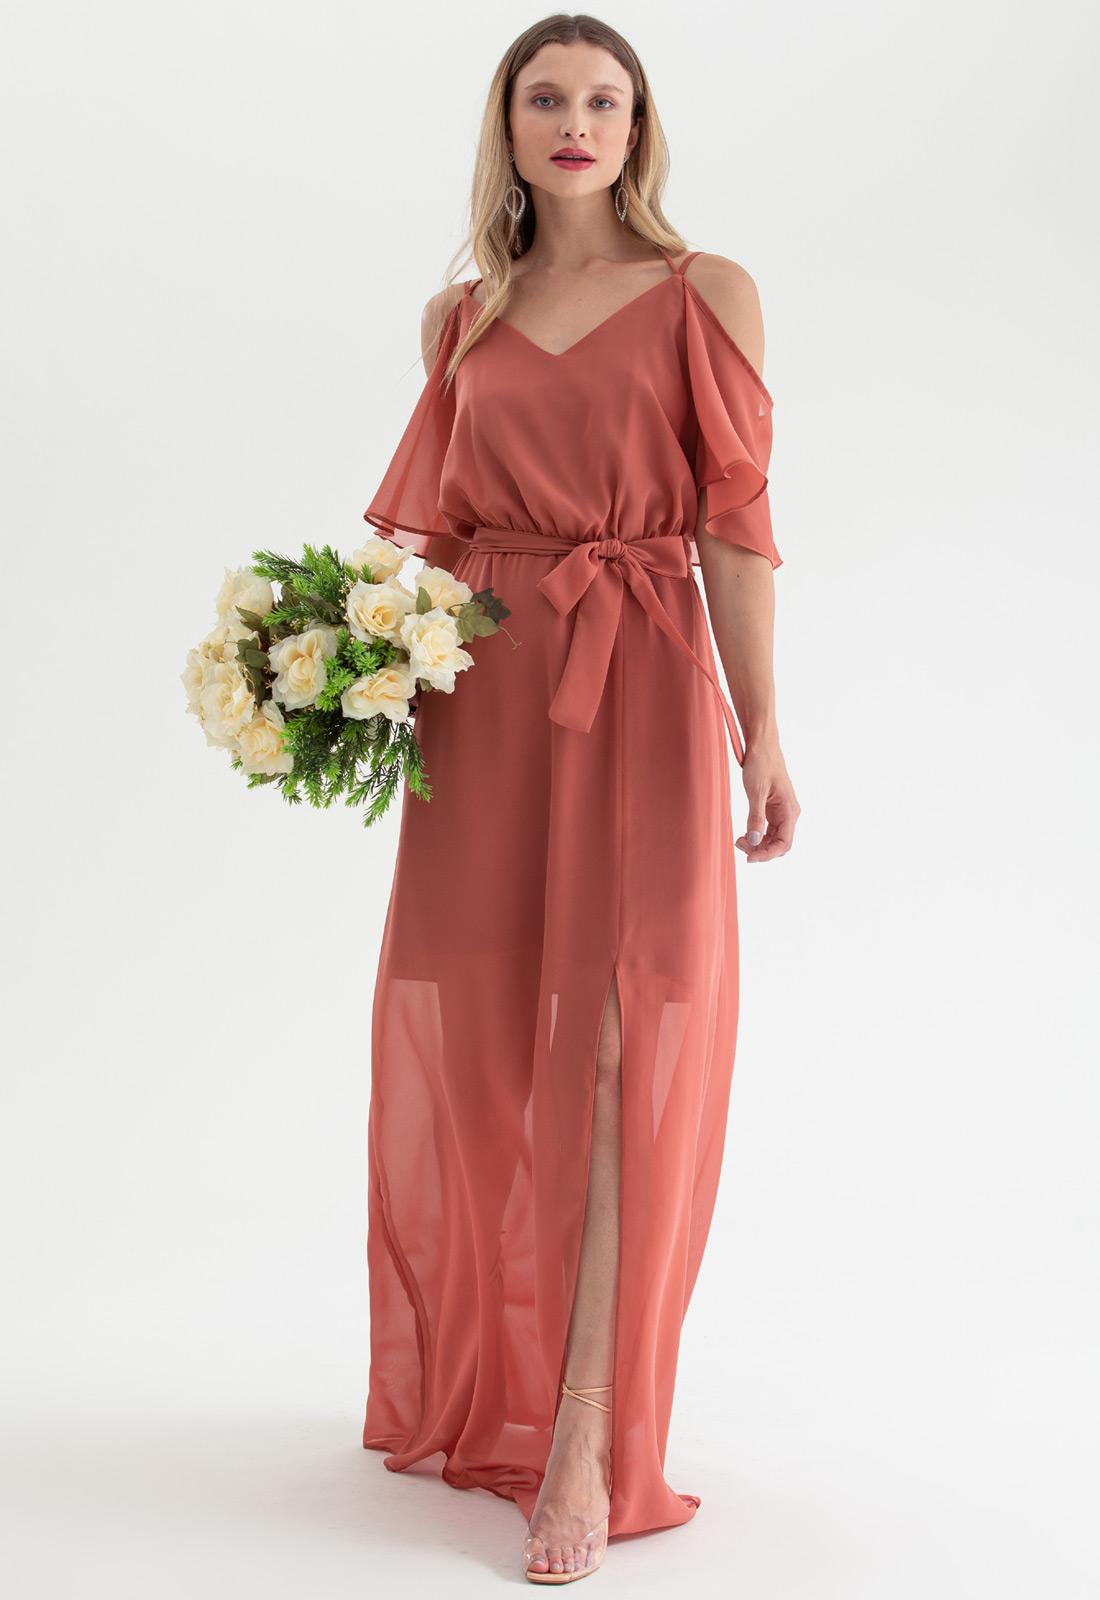 Vestido de festa terracota alça - Ref. 2468